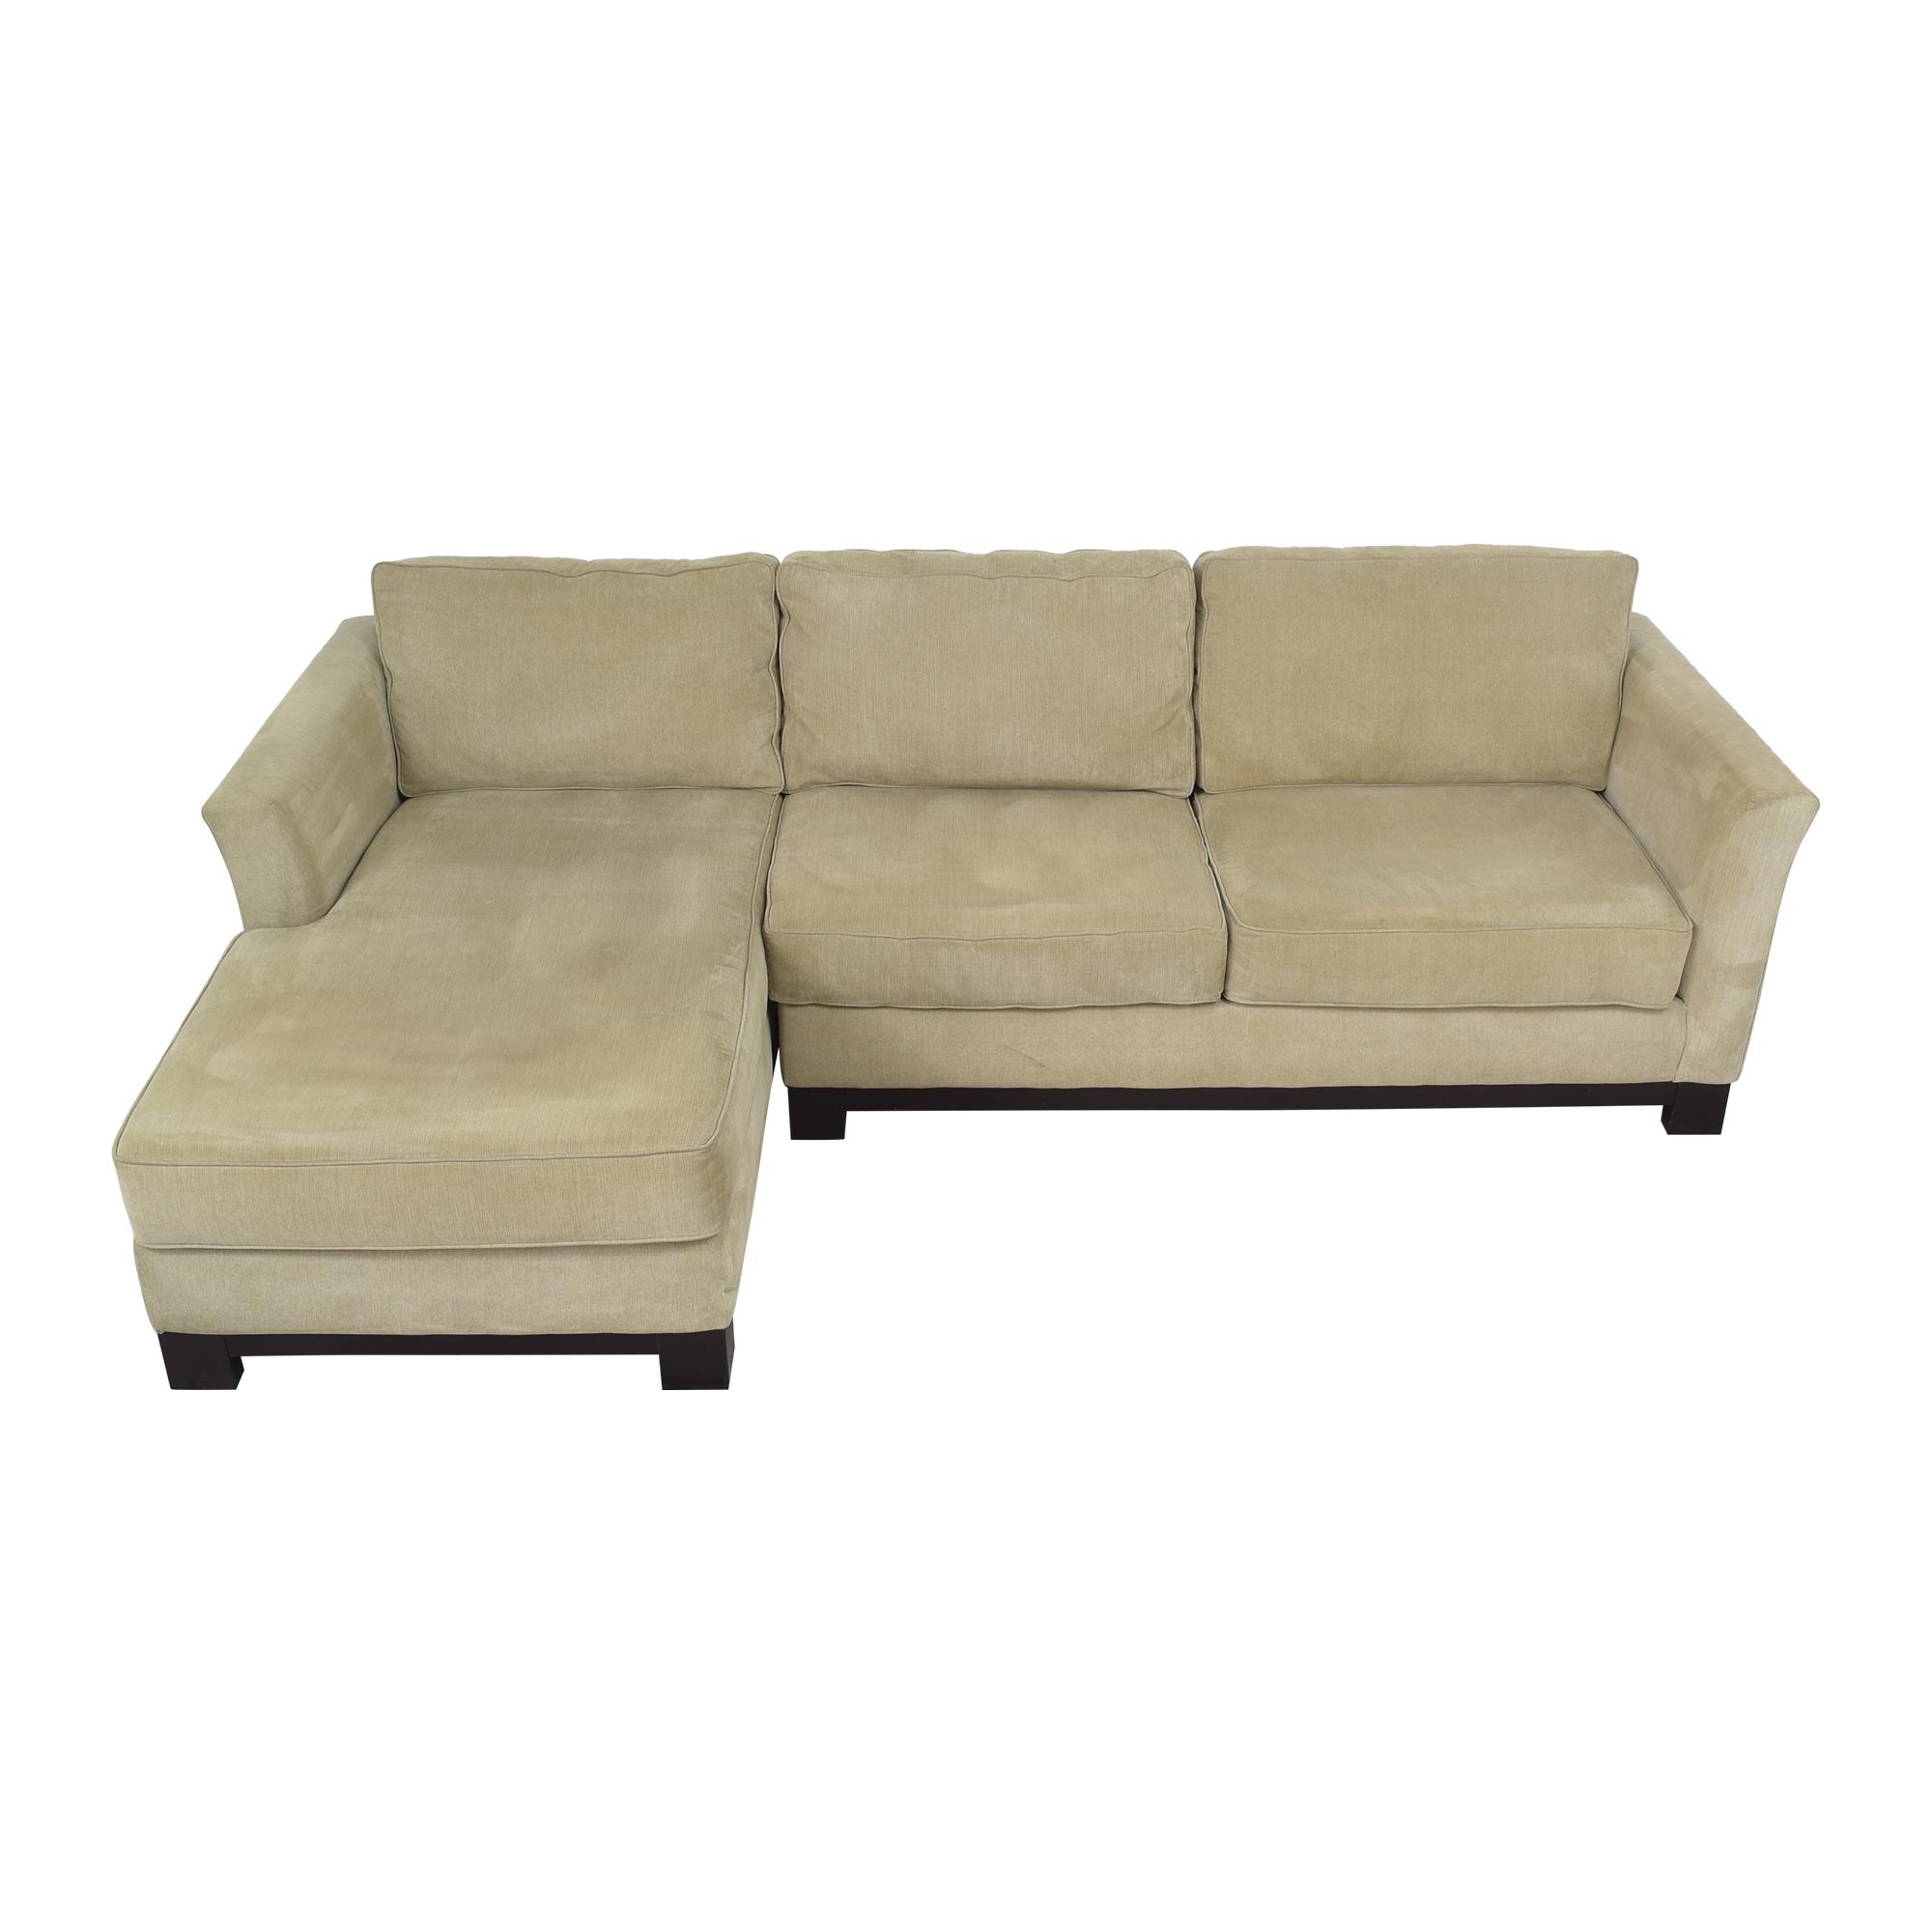 Macy's Macy's Elliot II Two Piece Chaise Sectional Sofa on sale